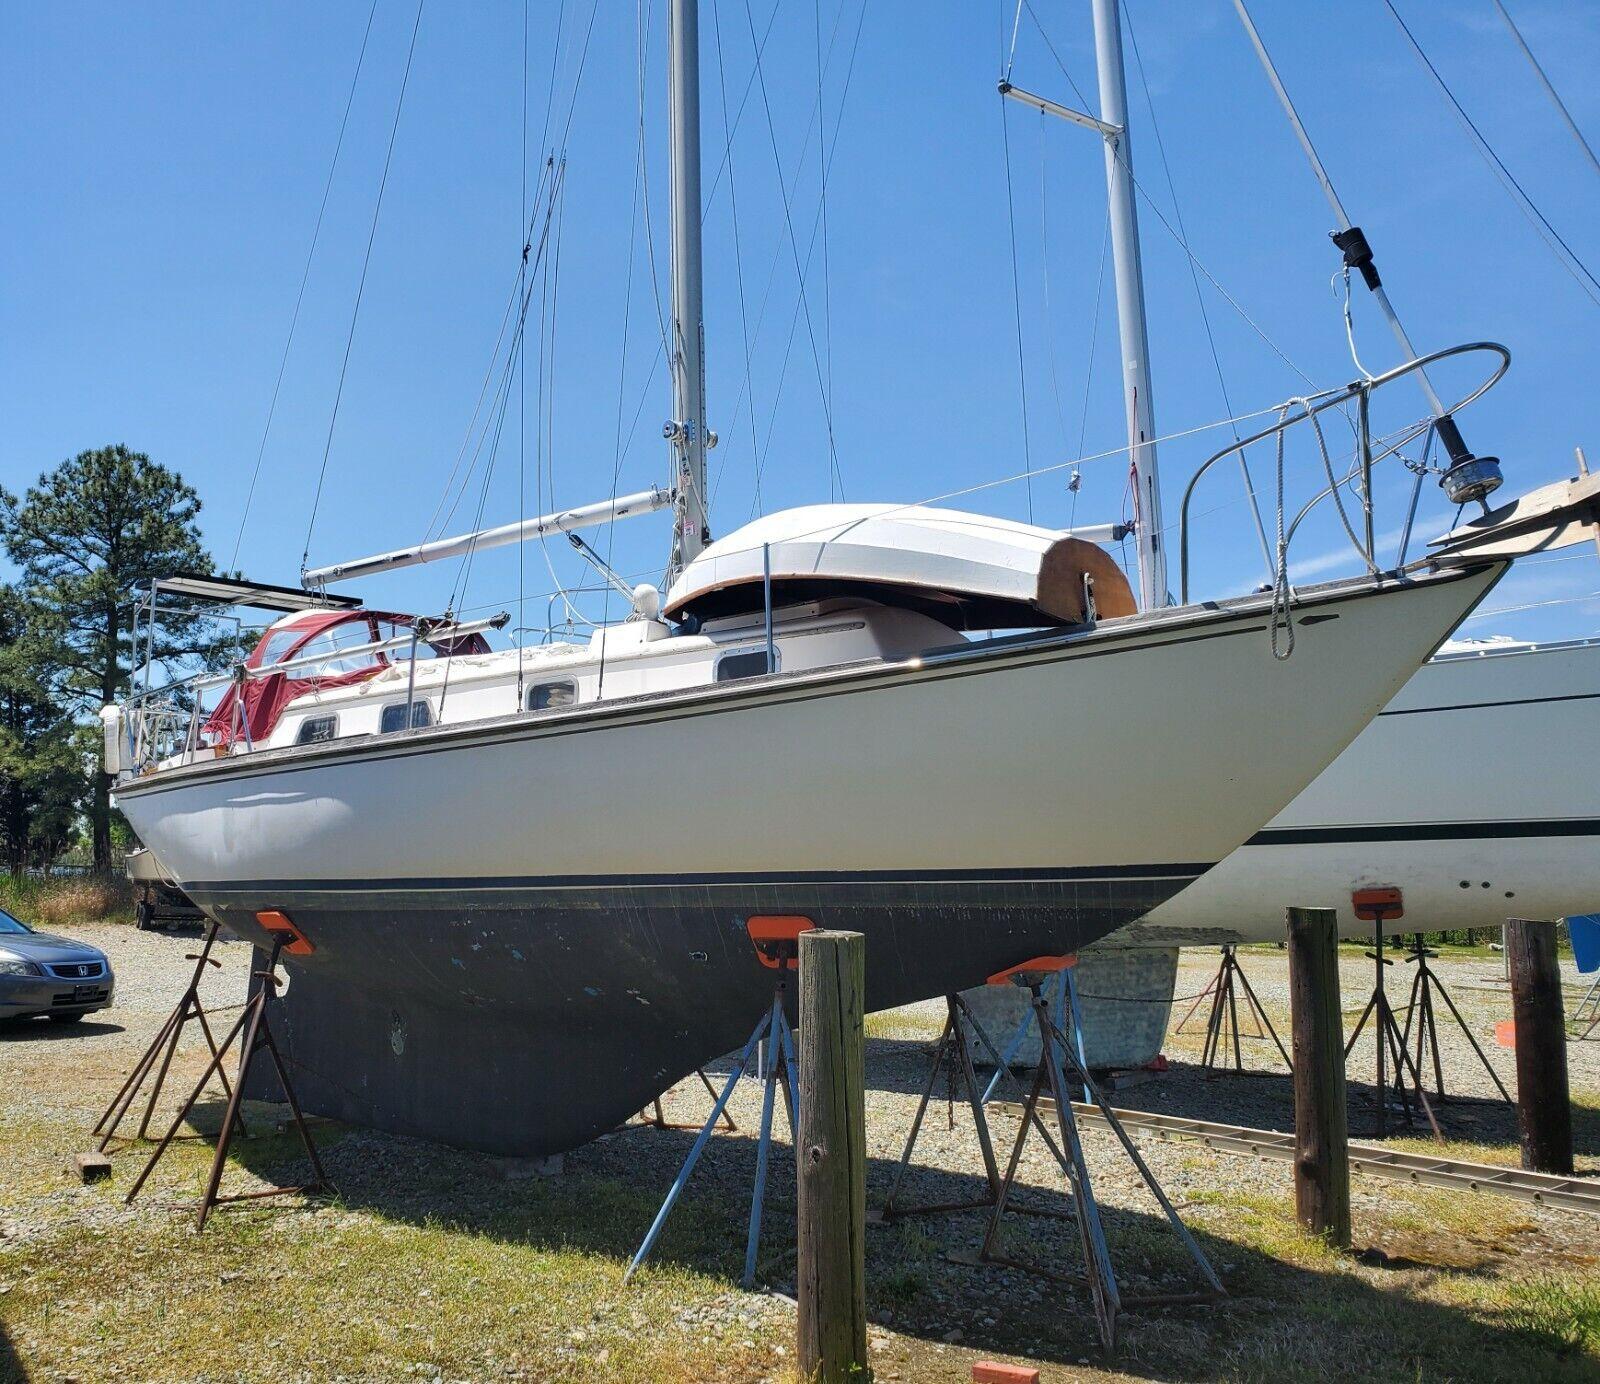 1978 Bristol 32' Sailboat - Maryland